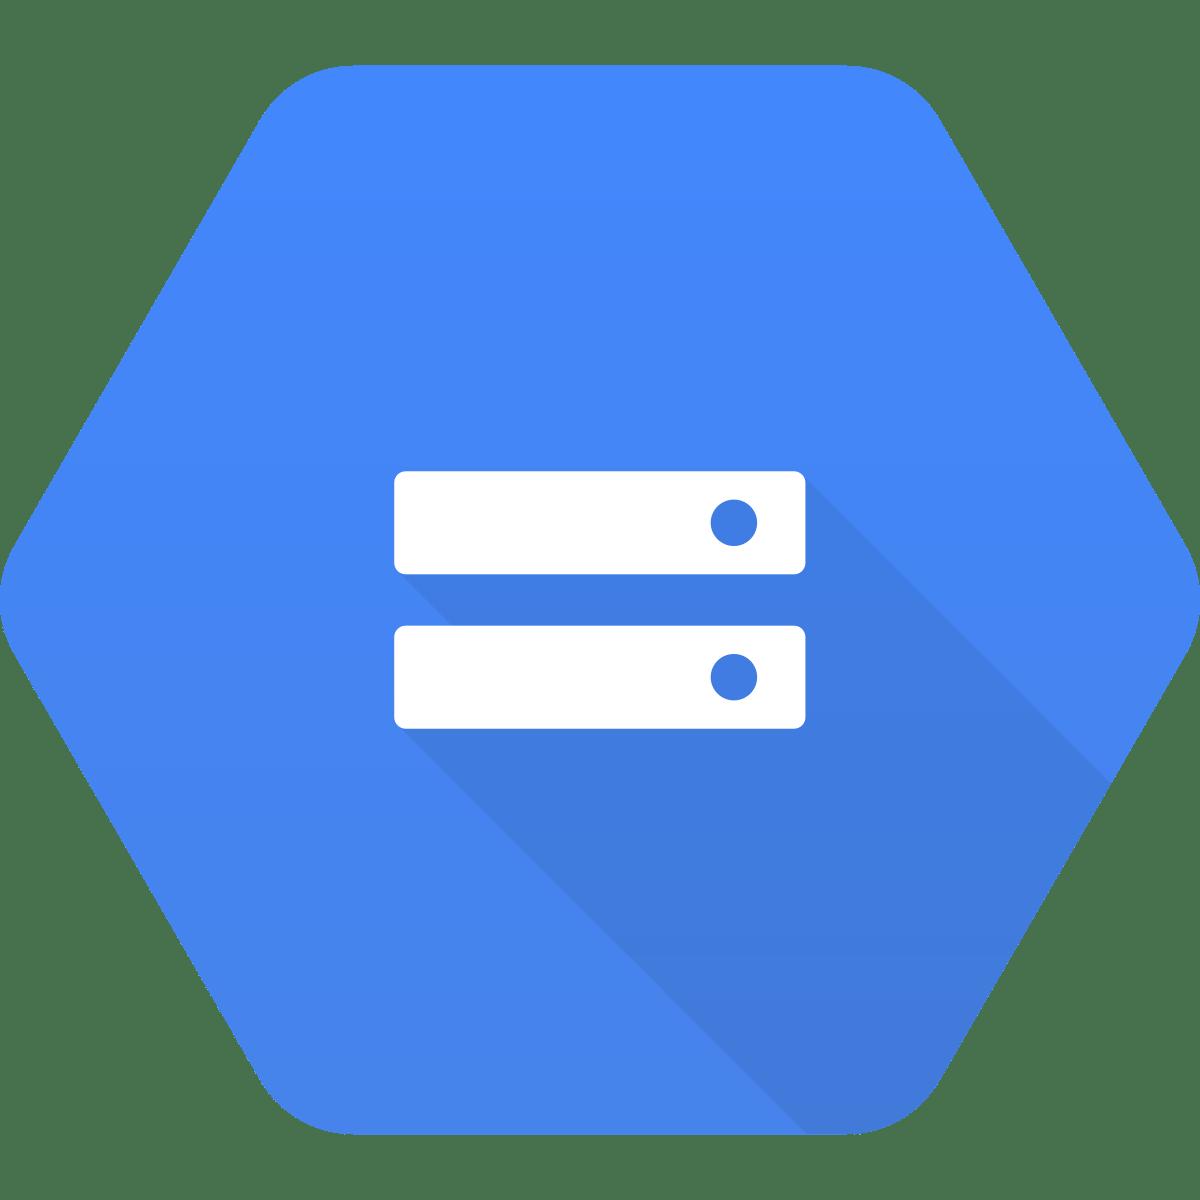 Google Cloud Storage